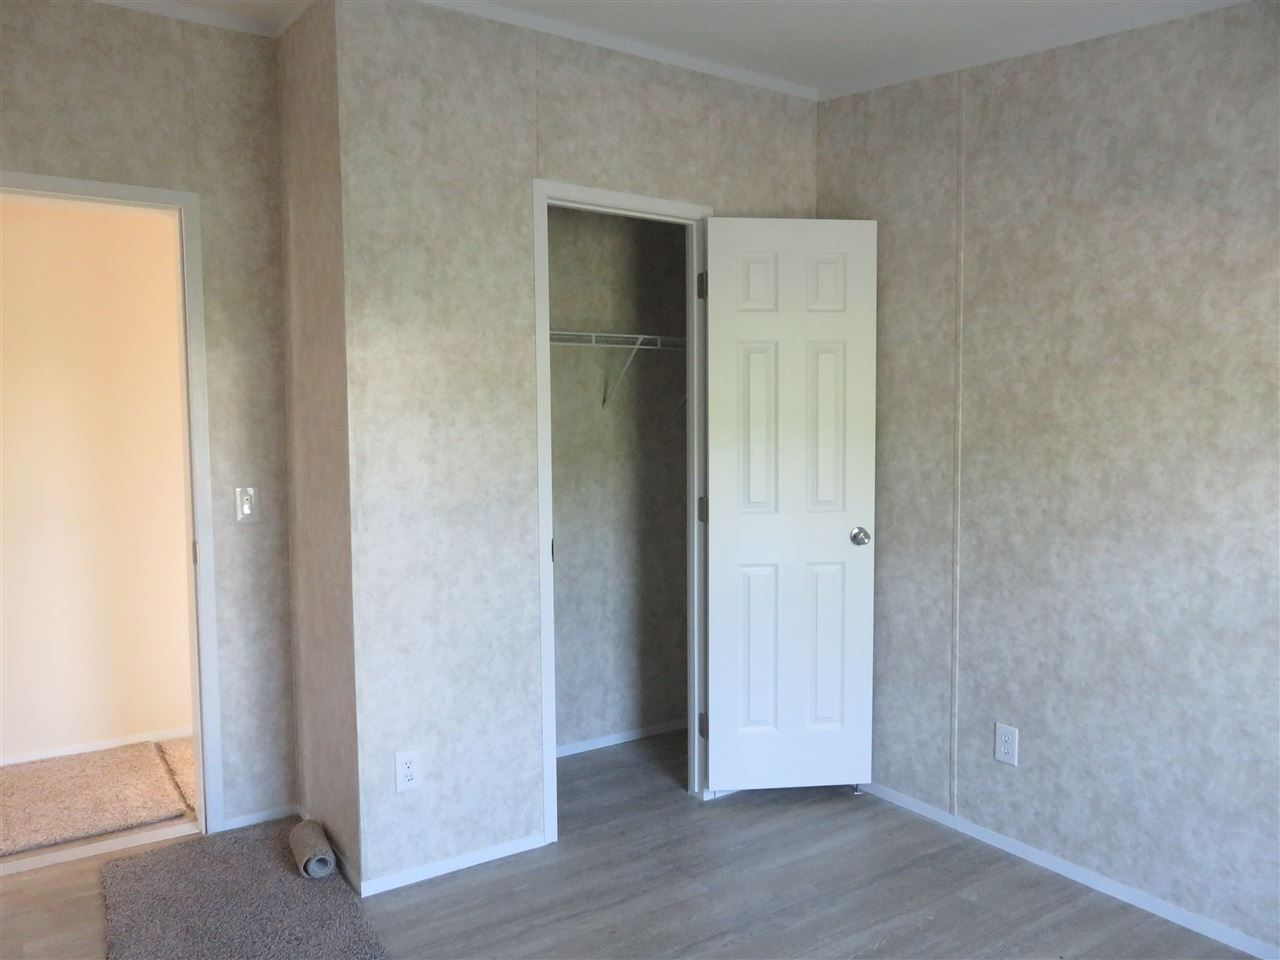 Bedroom Closet 12325598